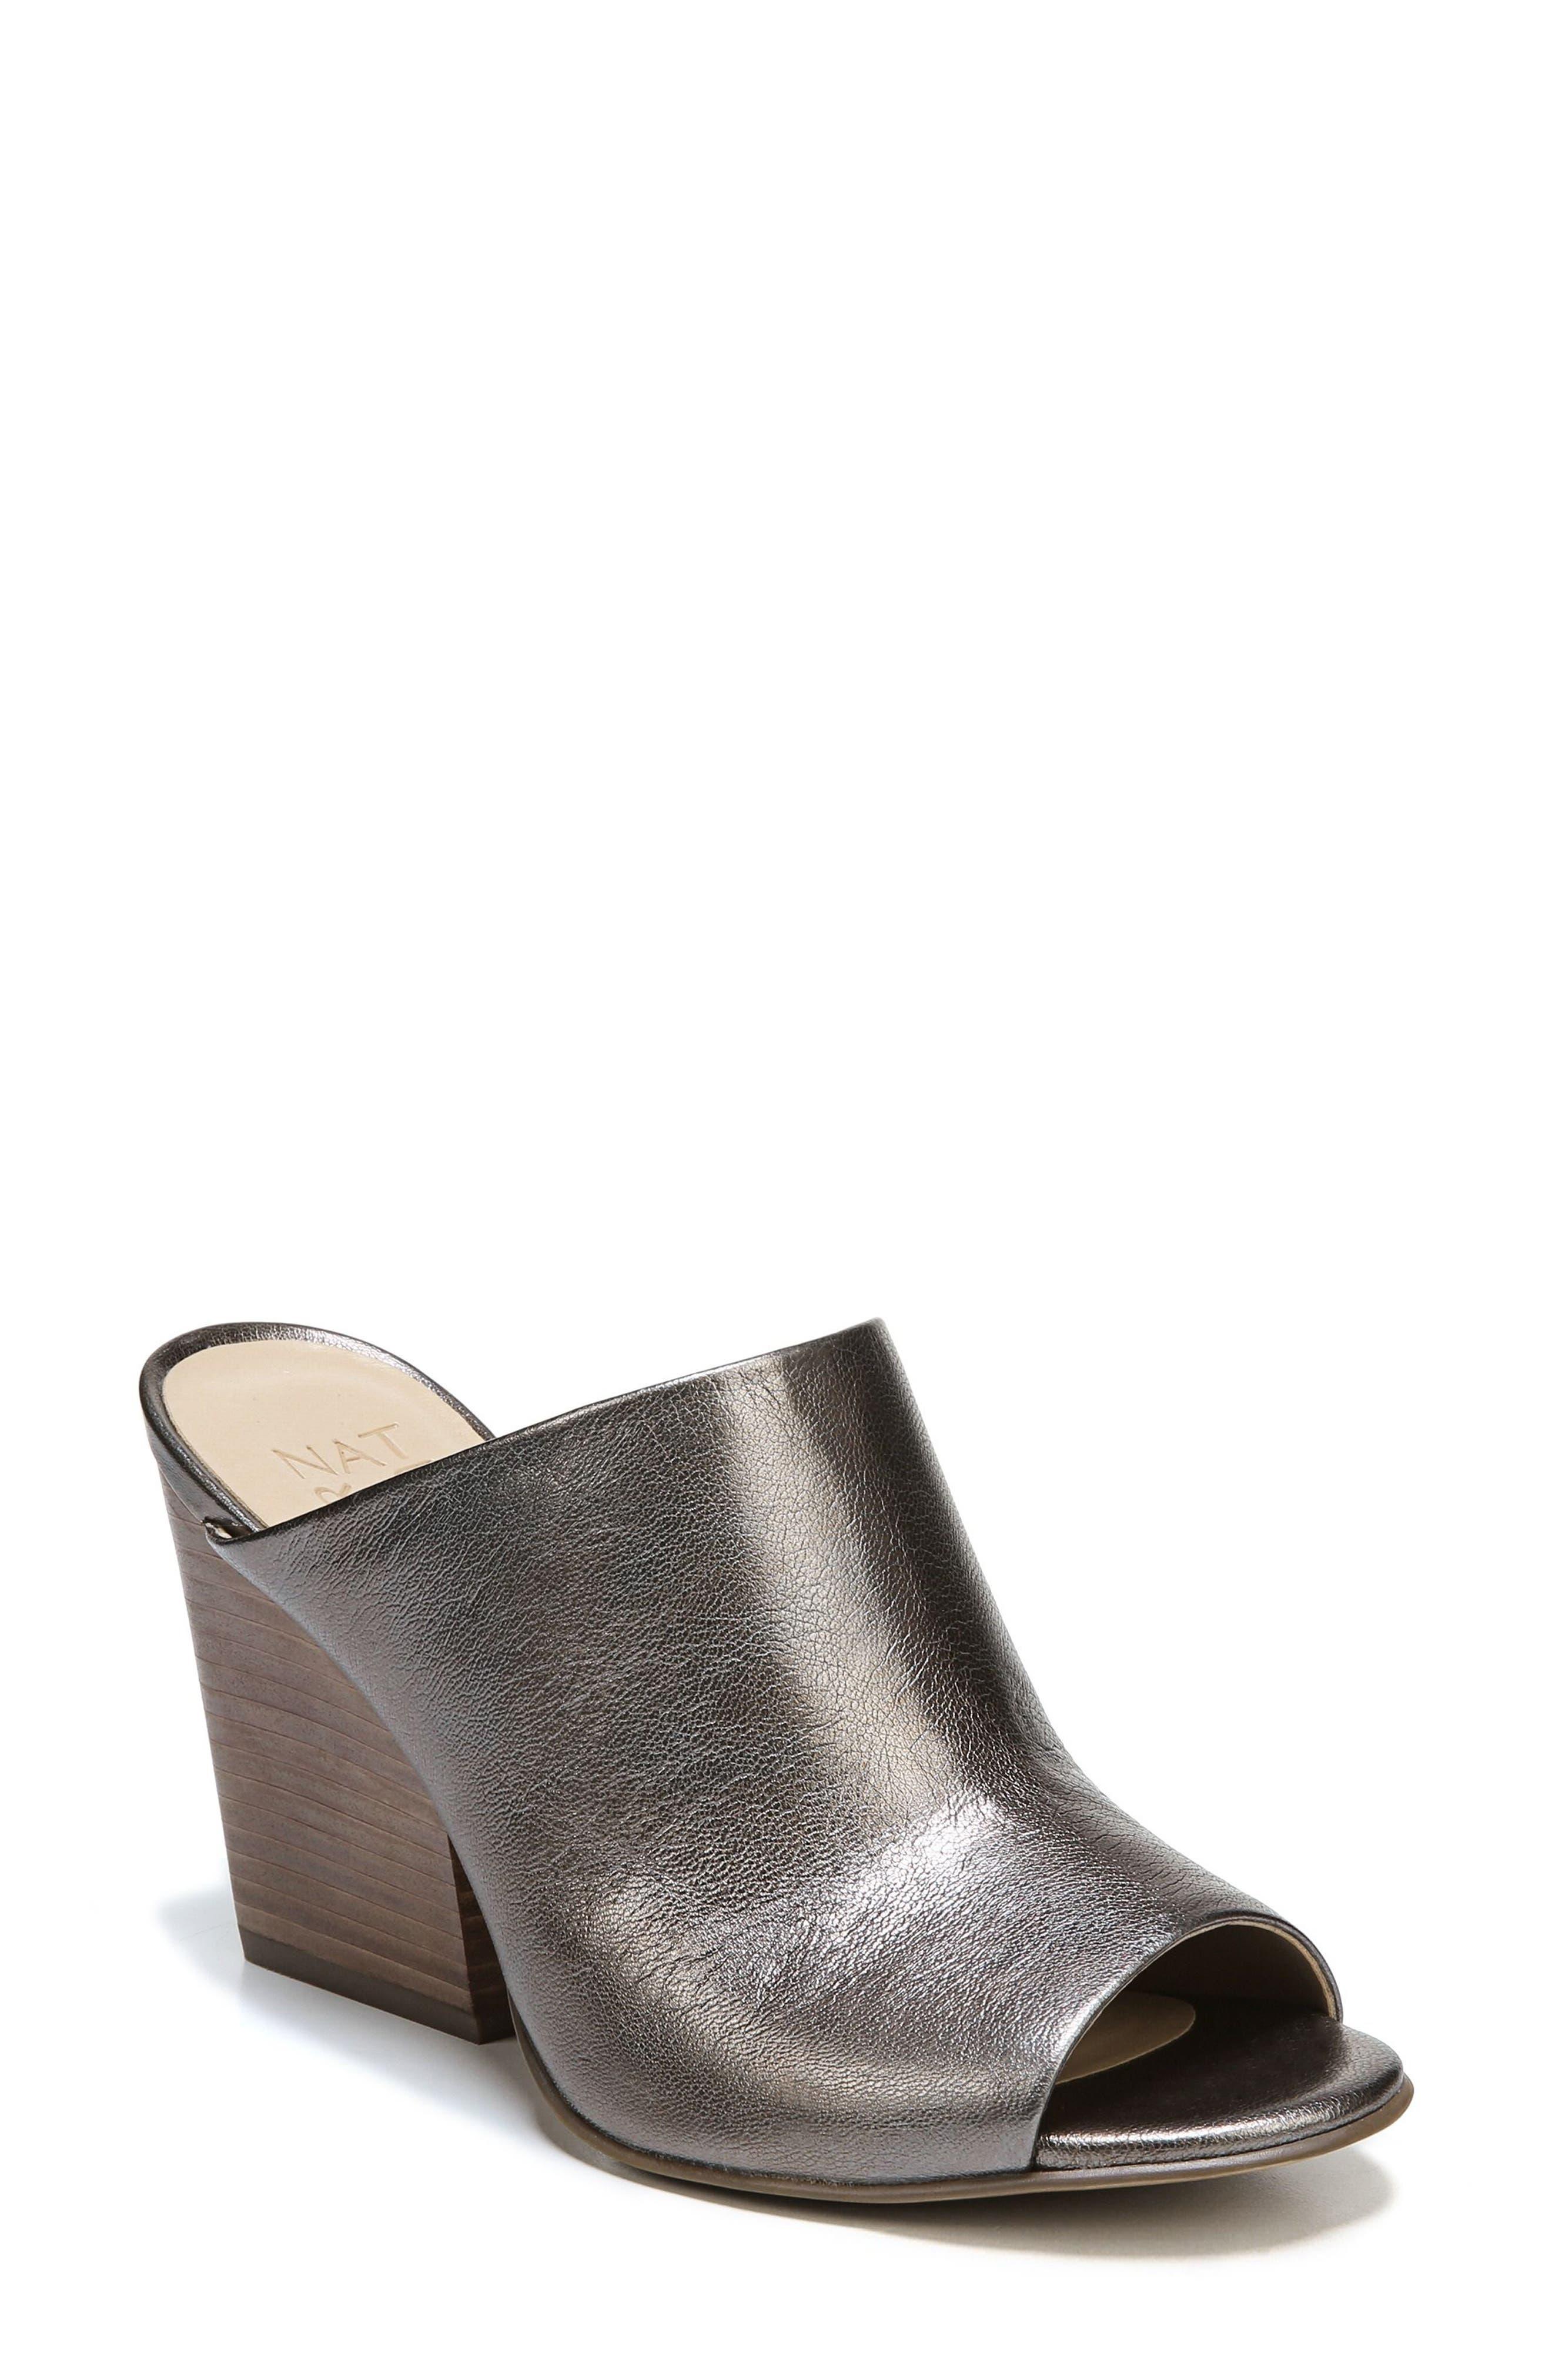 Sloan Sandal,                             Main thumbnail 1, color,                             Gunmetal Leather